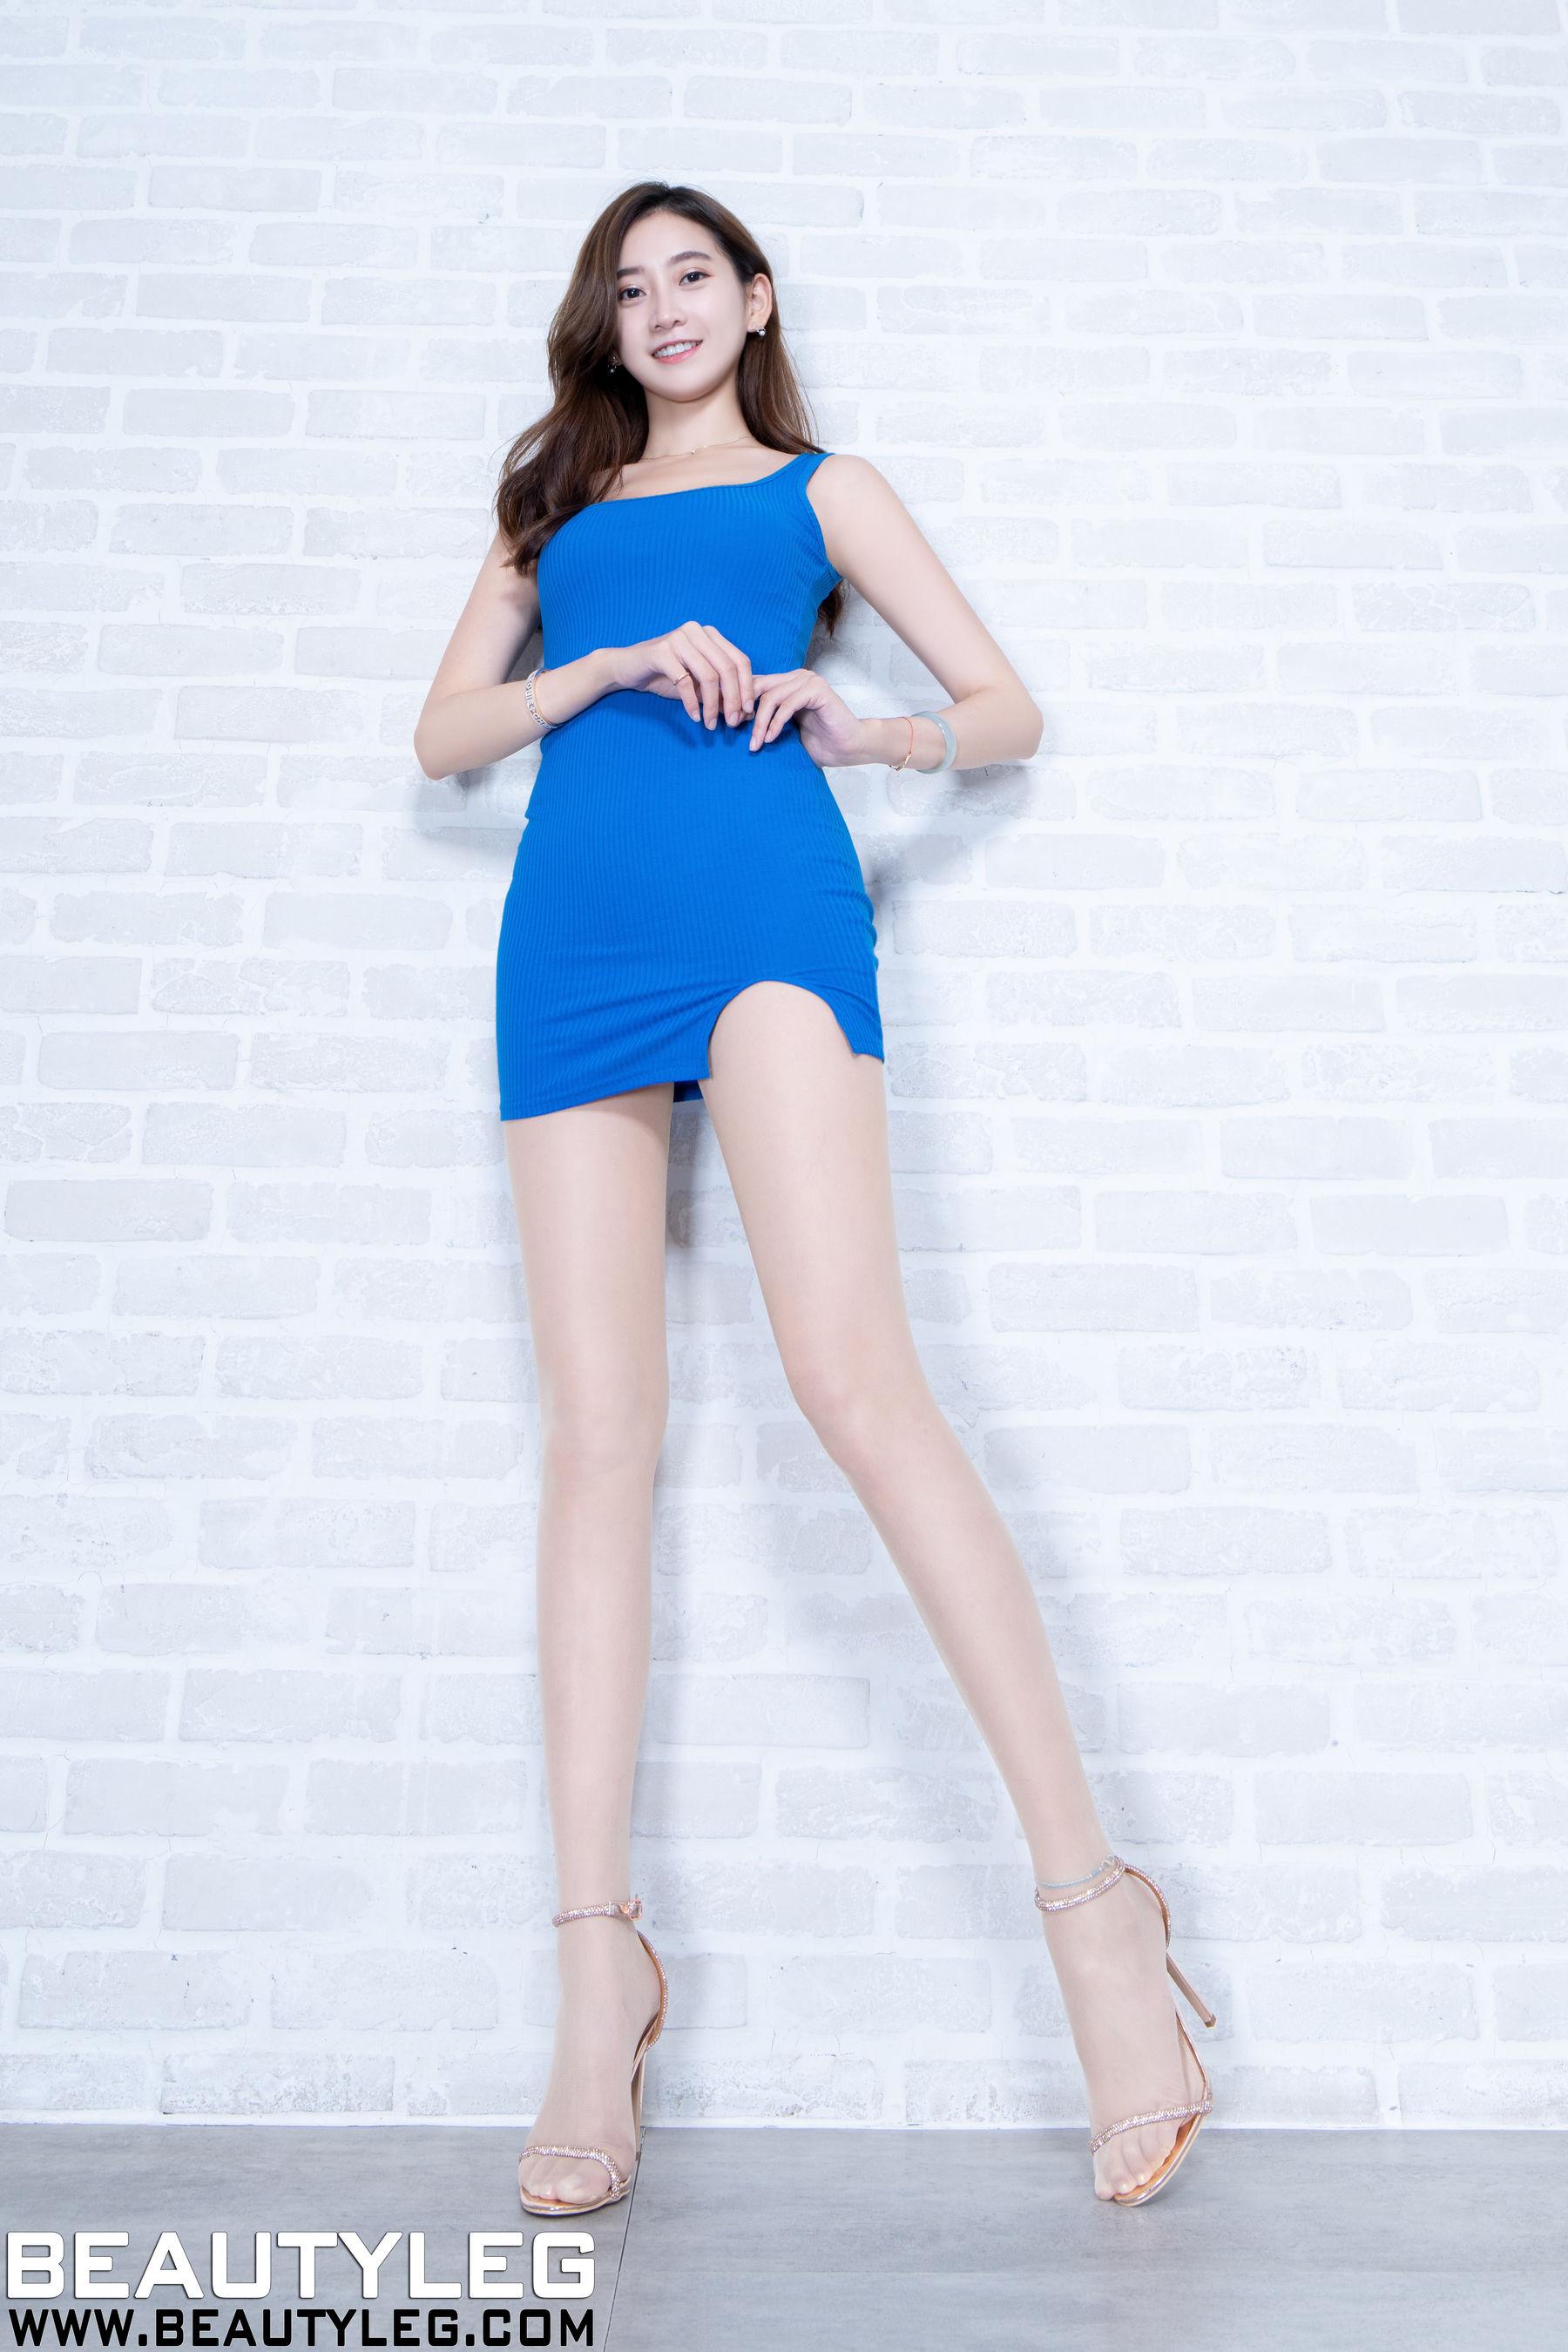 VOL.1185 [Beautyleg]丝袜美腿:腿模Leonie超高清个人性感漂亮大图(58P)